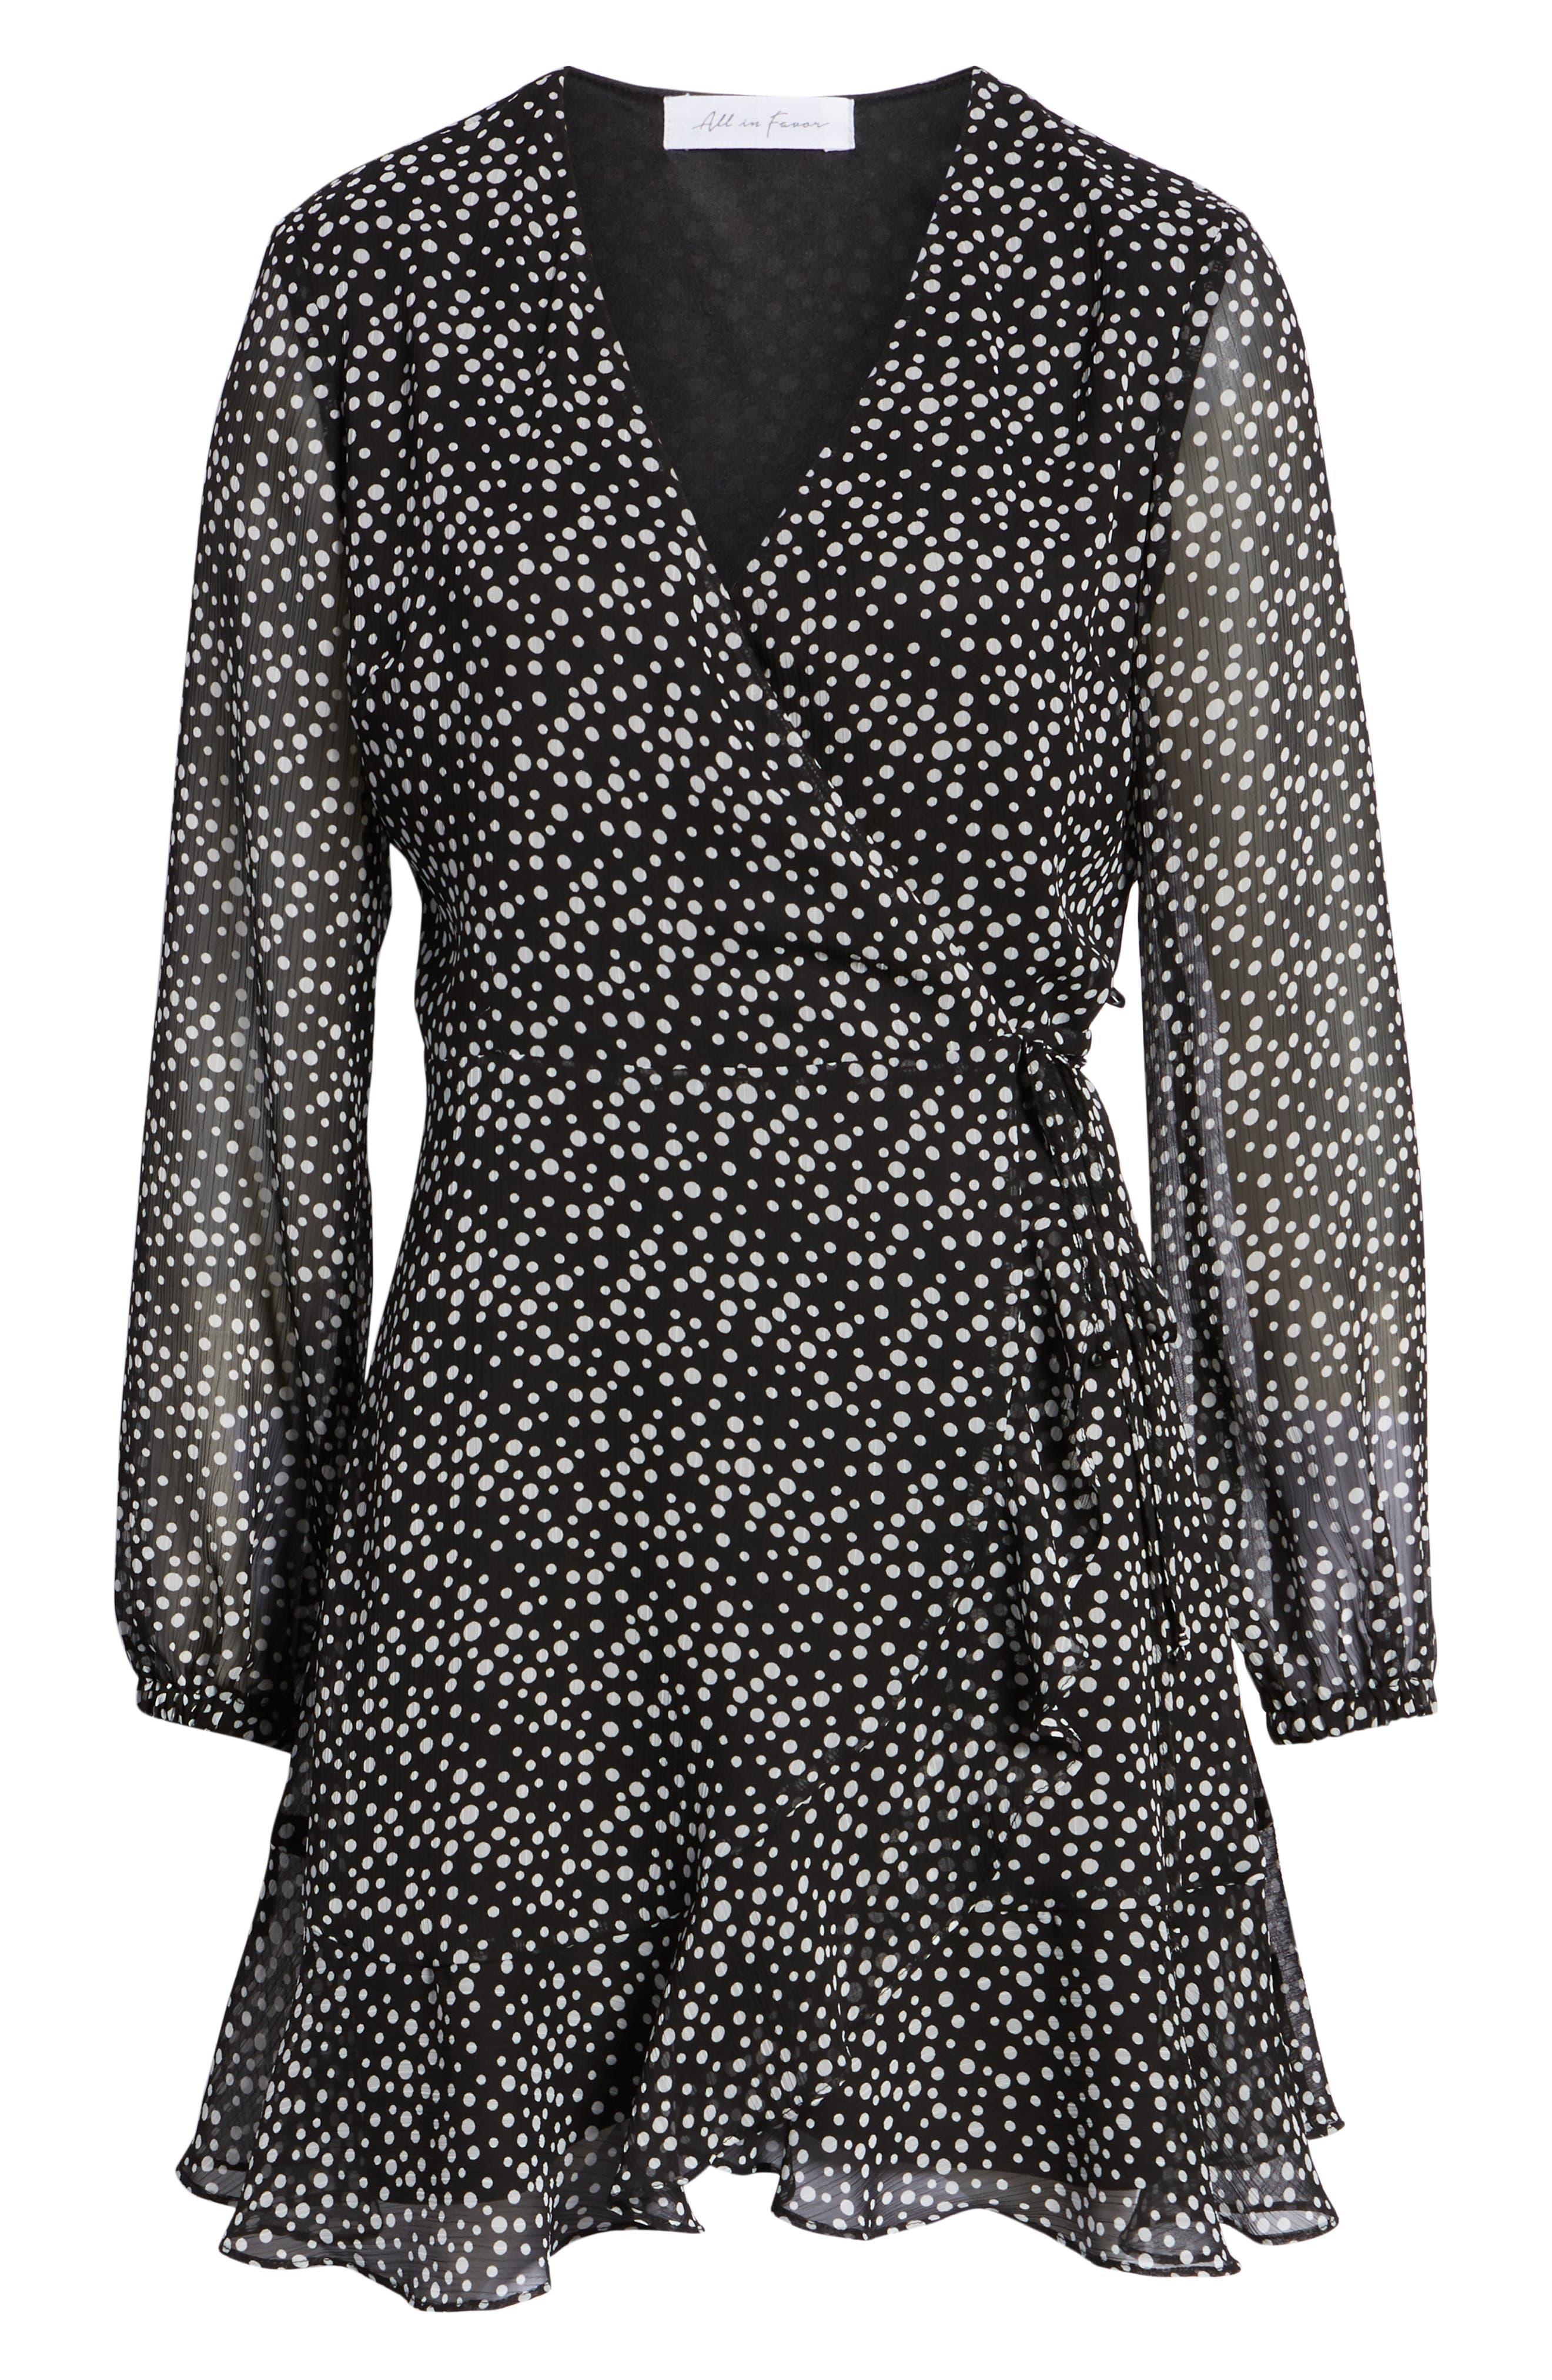 Brittany Wrap Minidress,                             Alternate thumbnail 6, color,                             BLACK WHITE DOT